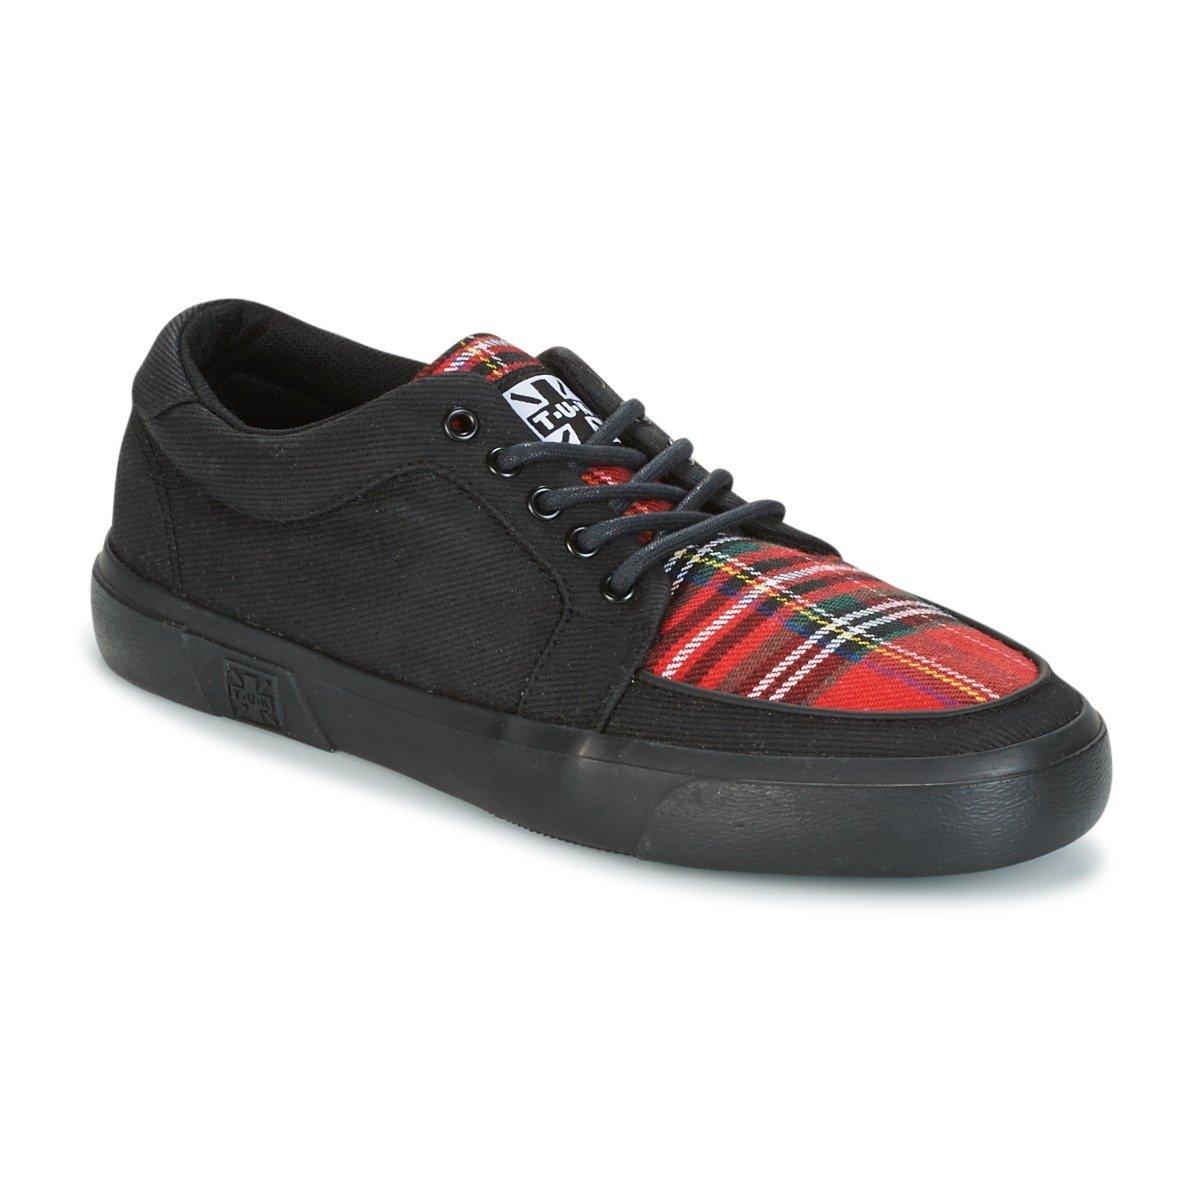 T.U.K. Shoes Black & Tartan Canvas VLK Creeper Sneaker - Click Image to Close